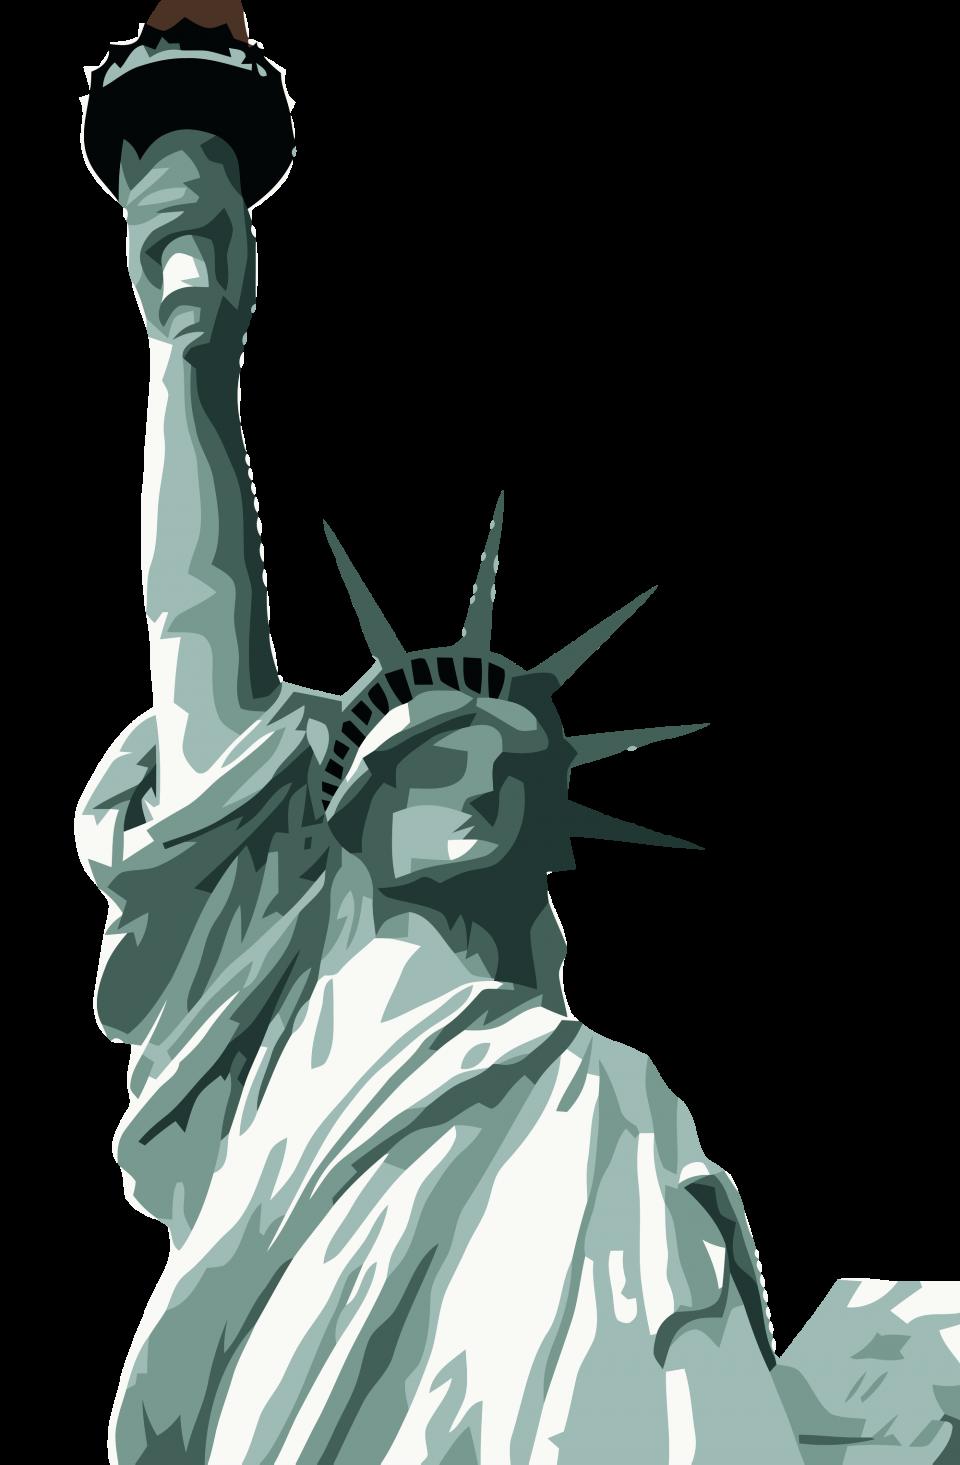 Statue Of Liberty Png Image Statue Statue Of Liberty Liberty